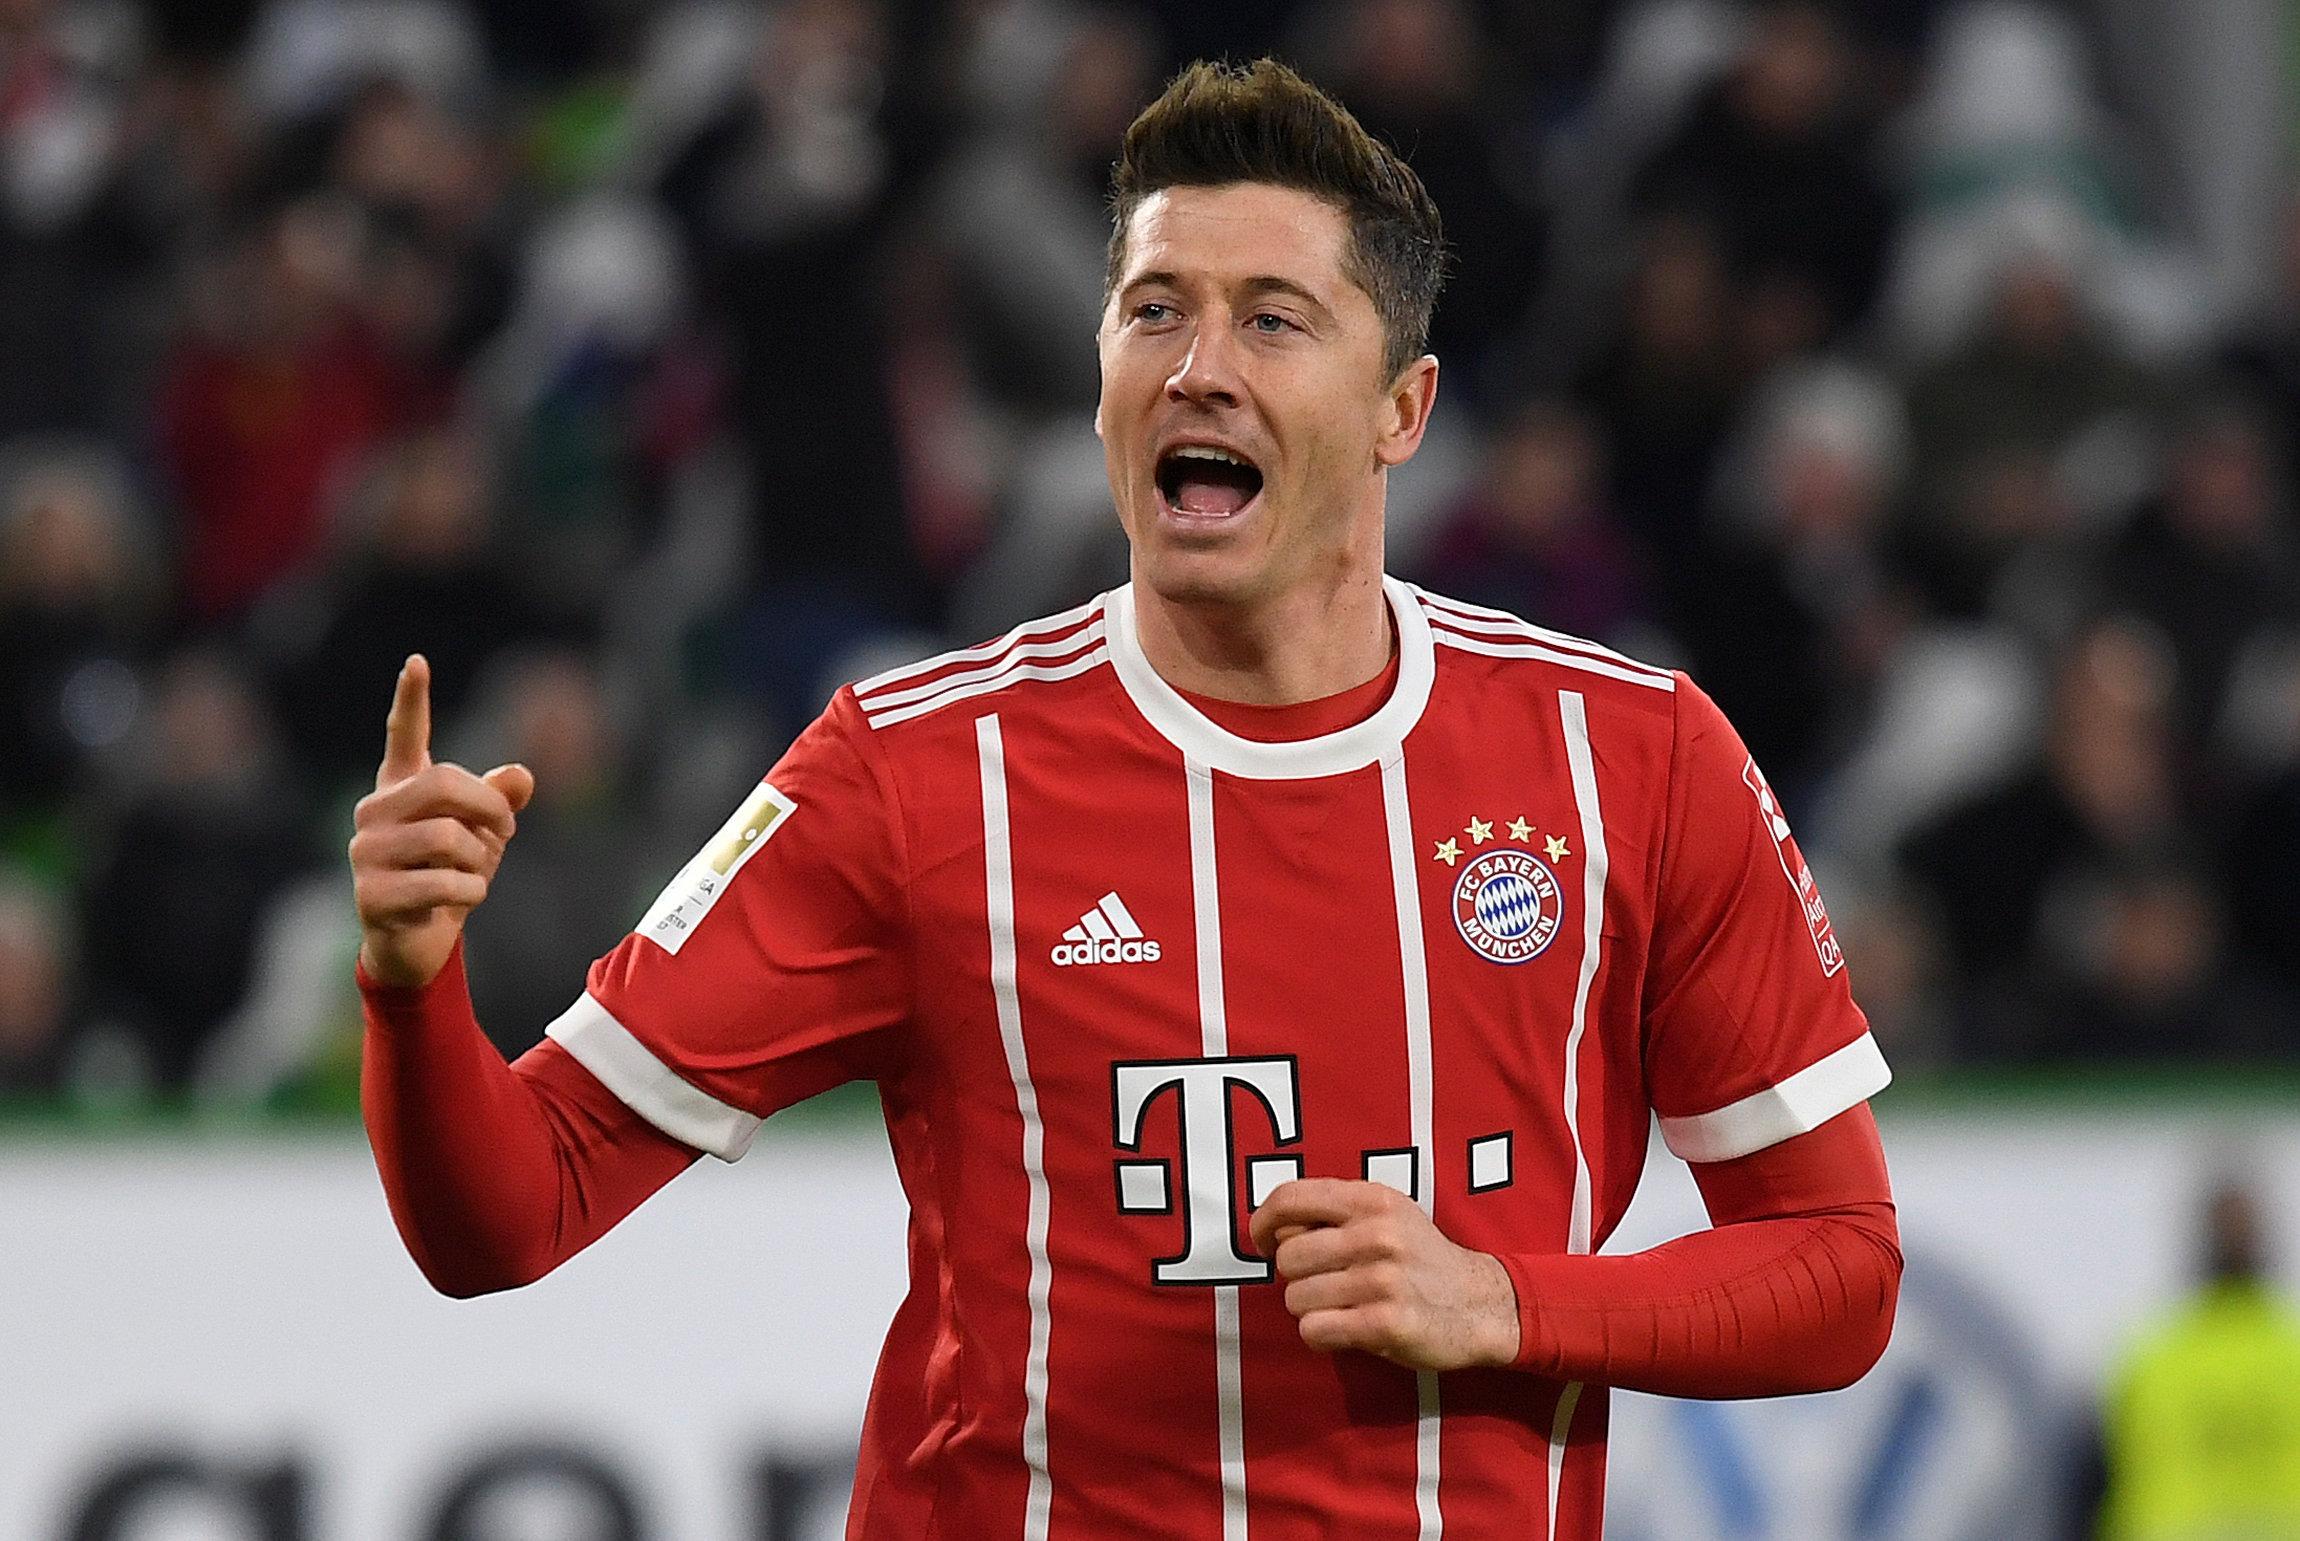 Football - Transferts - Le journal du mercato : Robert Lewandowski dans le viseur du PSG ?